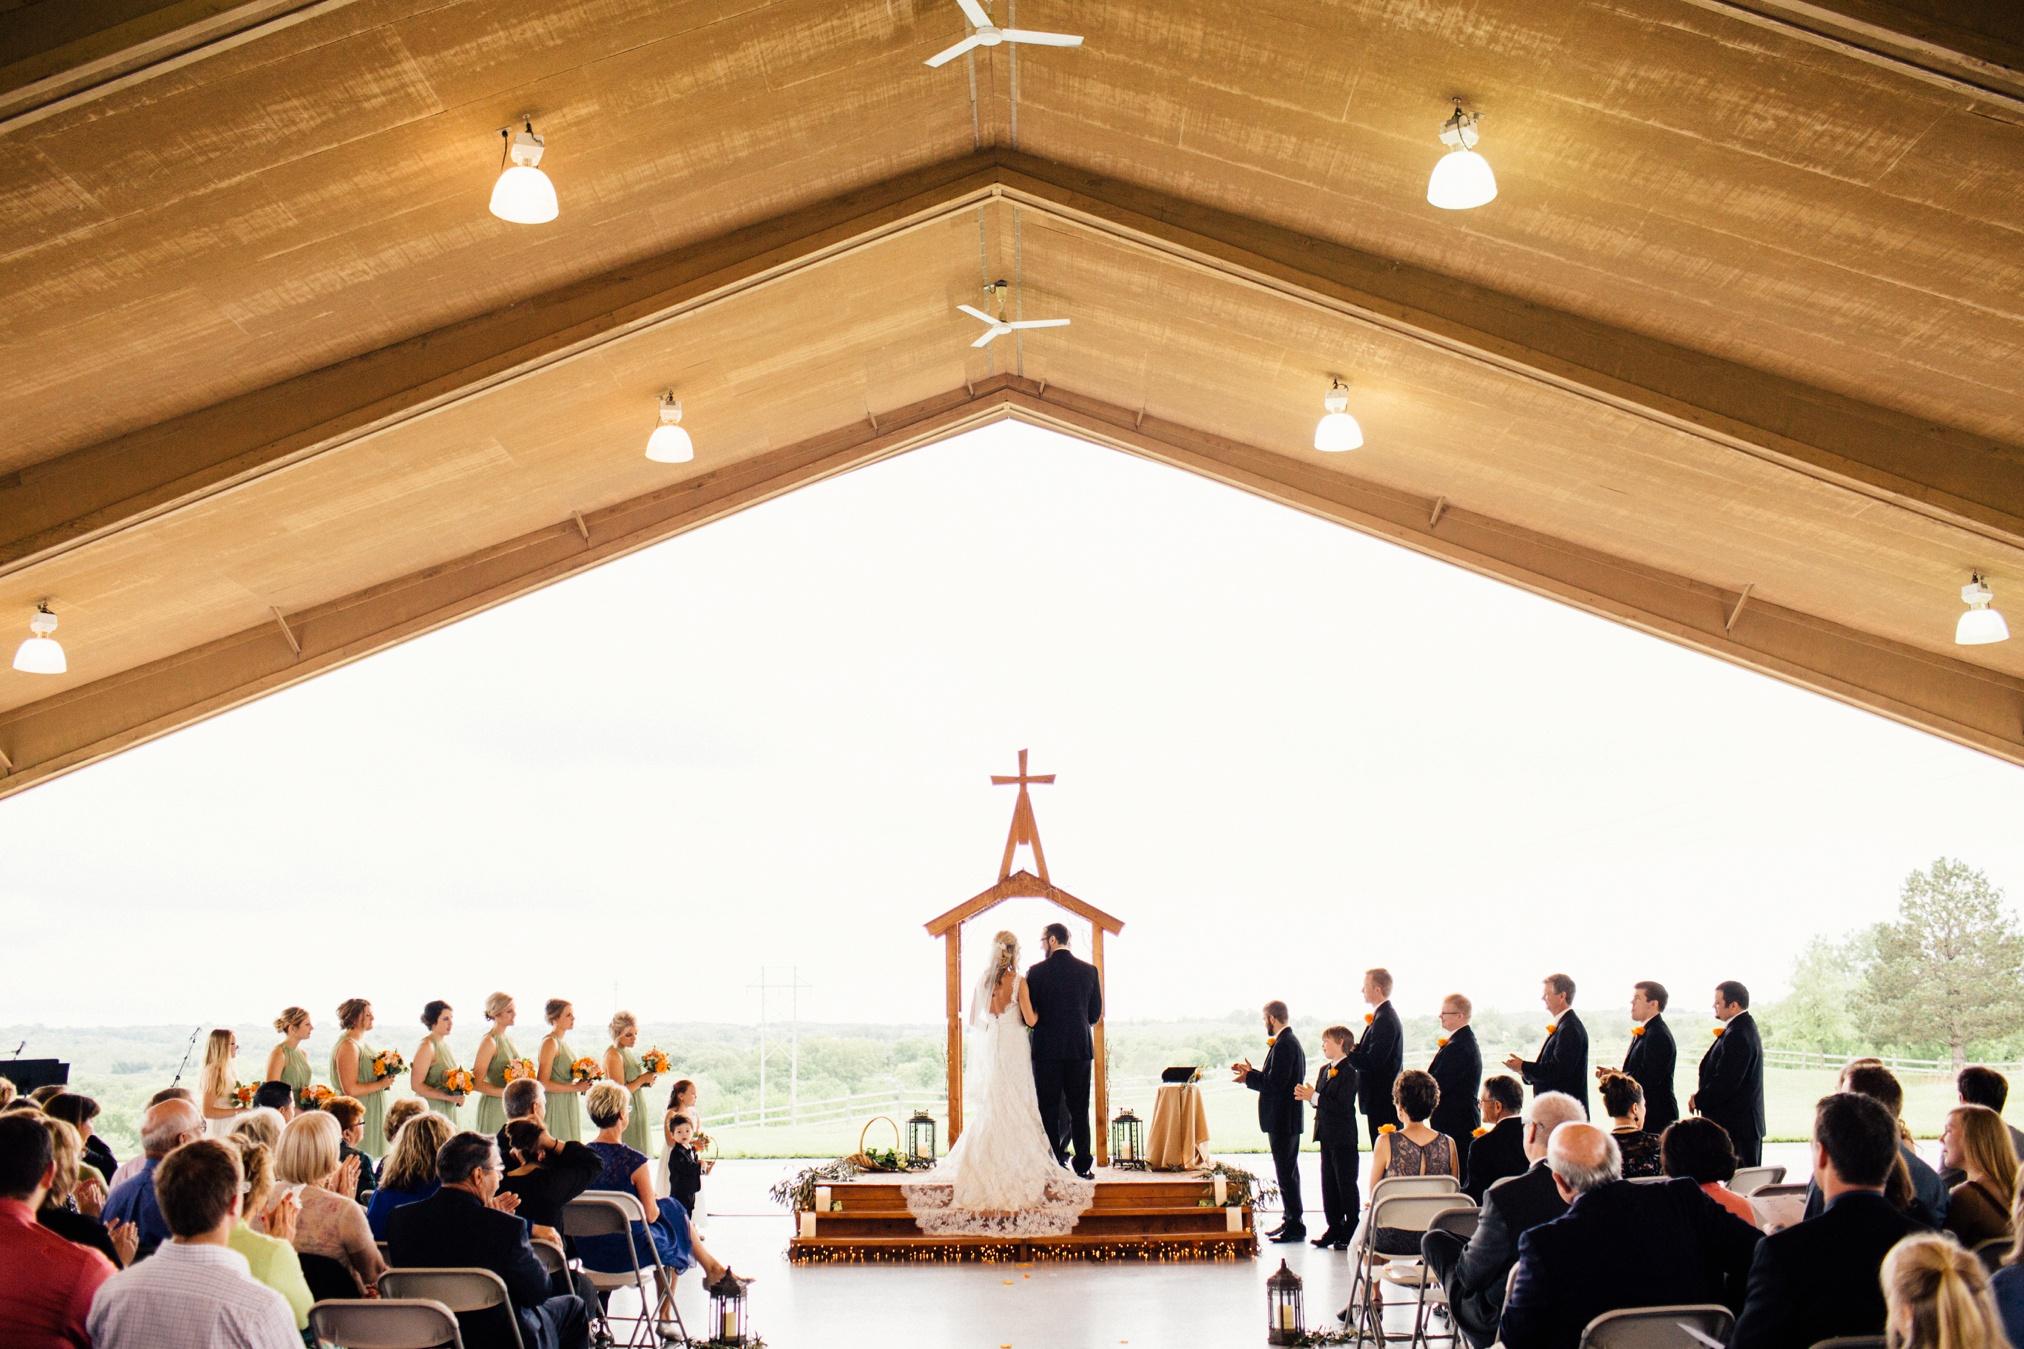 schmid_wedding-407.jpg